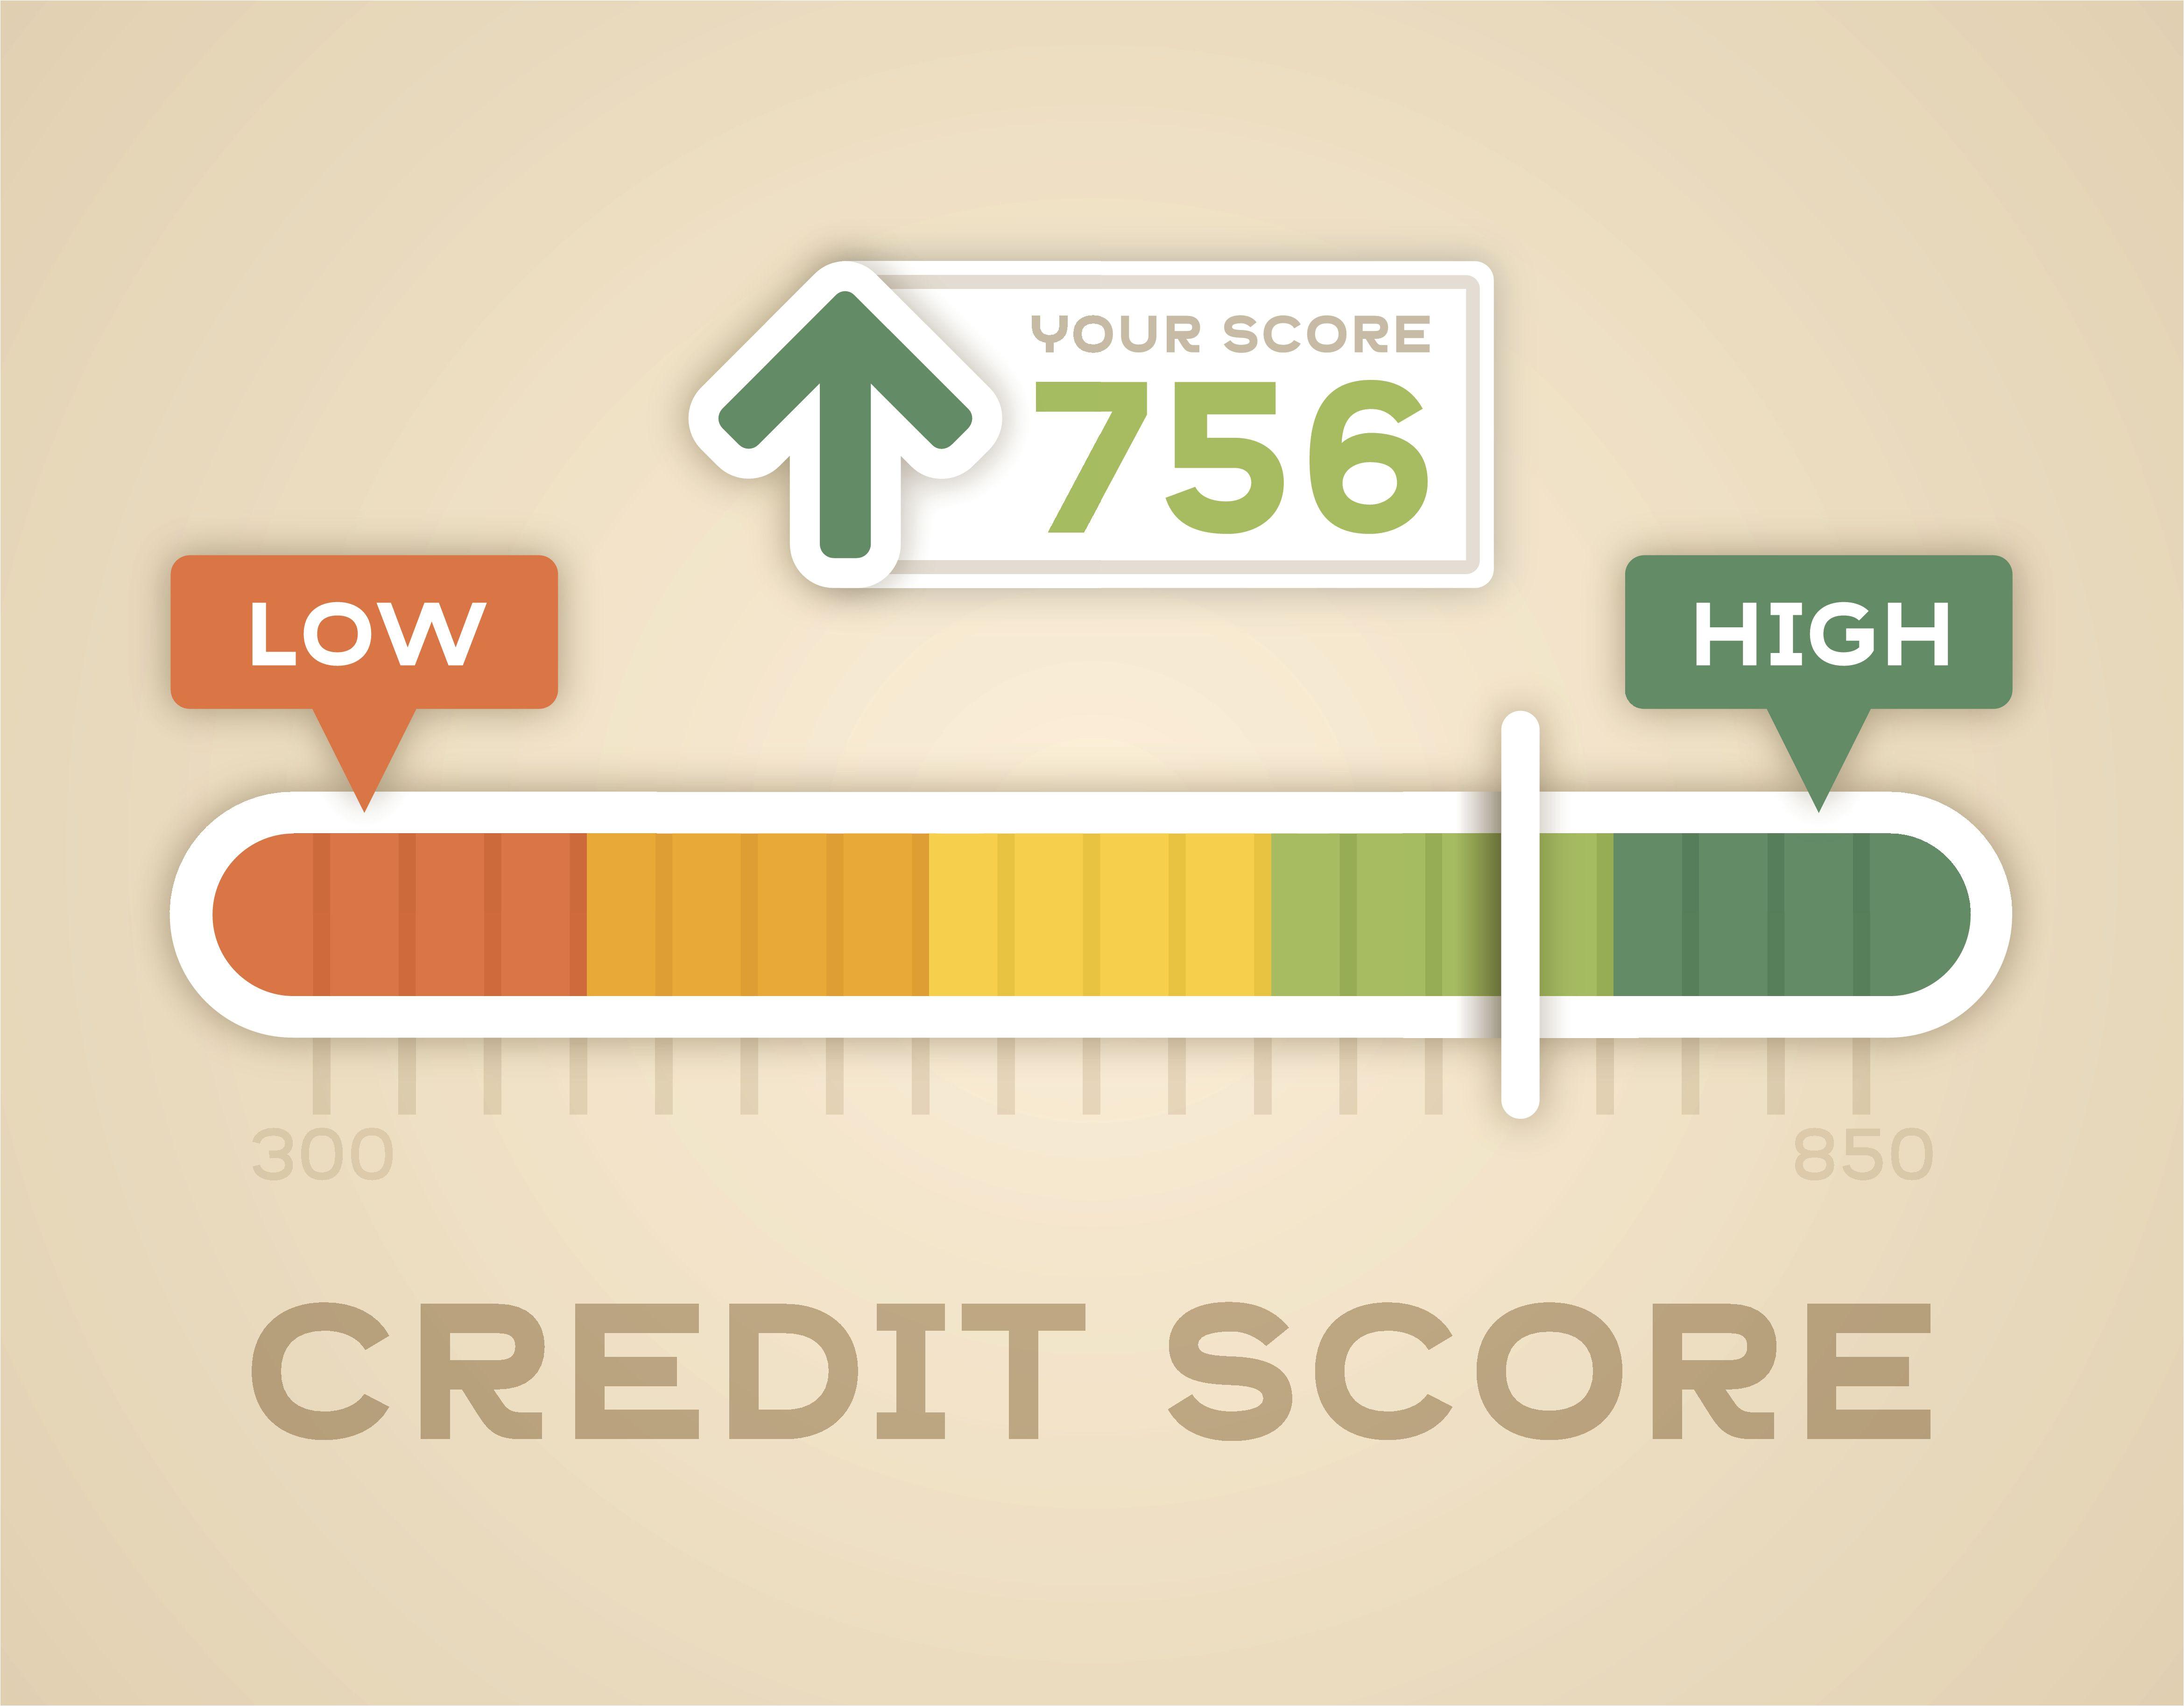 credit score meter 479975350 577467105f9b585875bd3803 jpg